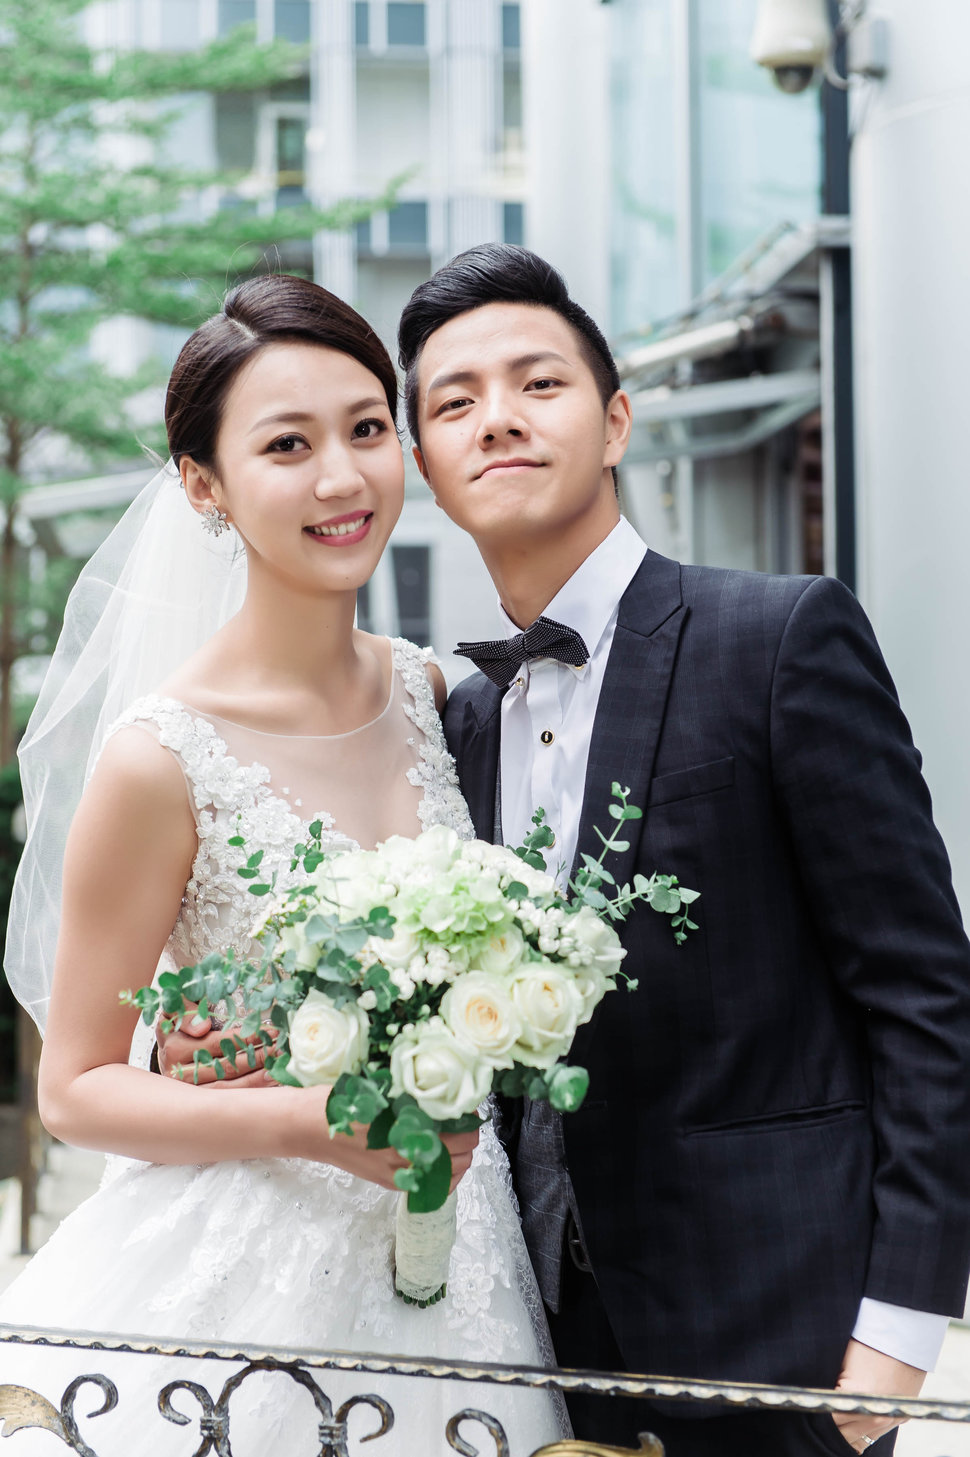 2017-11-05-12h46m11-JHA_9013 - Vicky Li 新娘秘書《結婚吧》